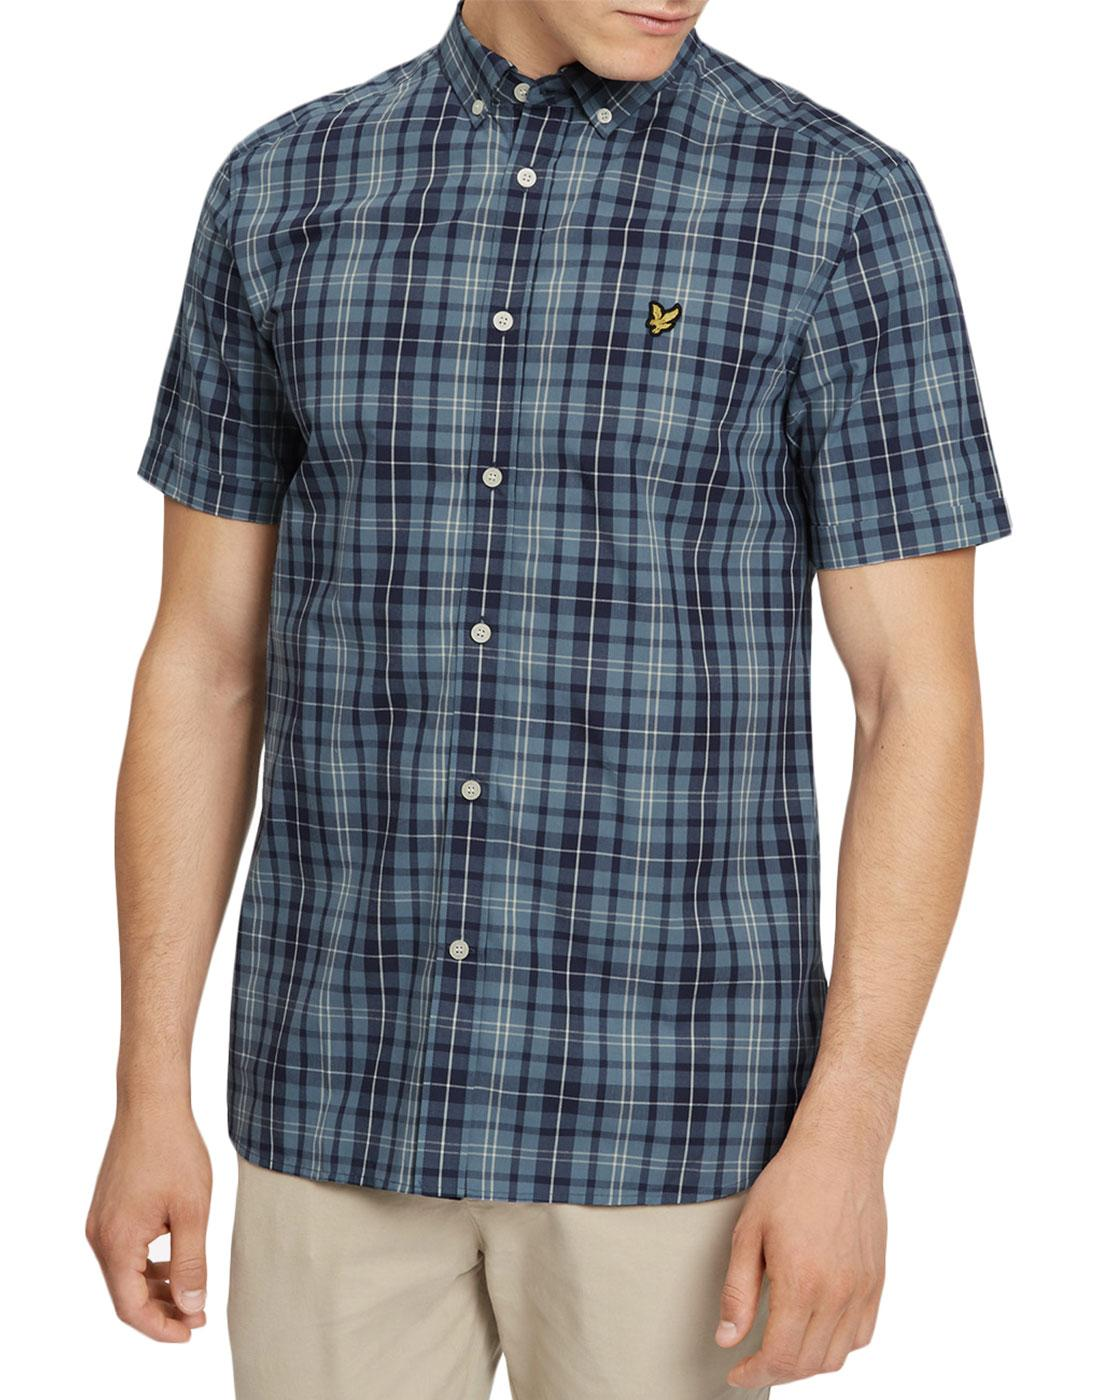 LYLE & SCOTT Men's Mod Plaid Check SS Shirt (MB)